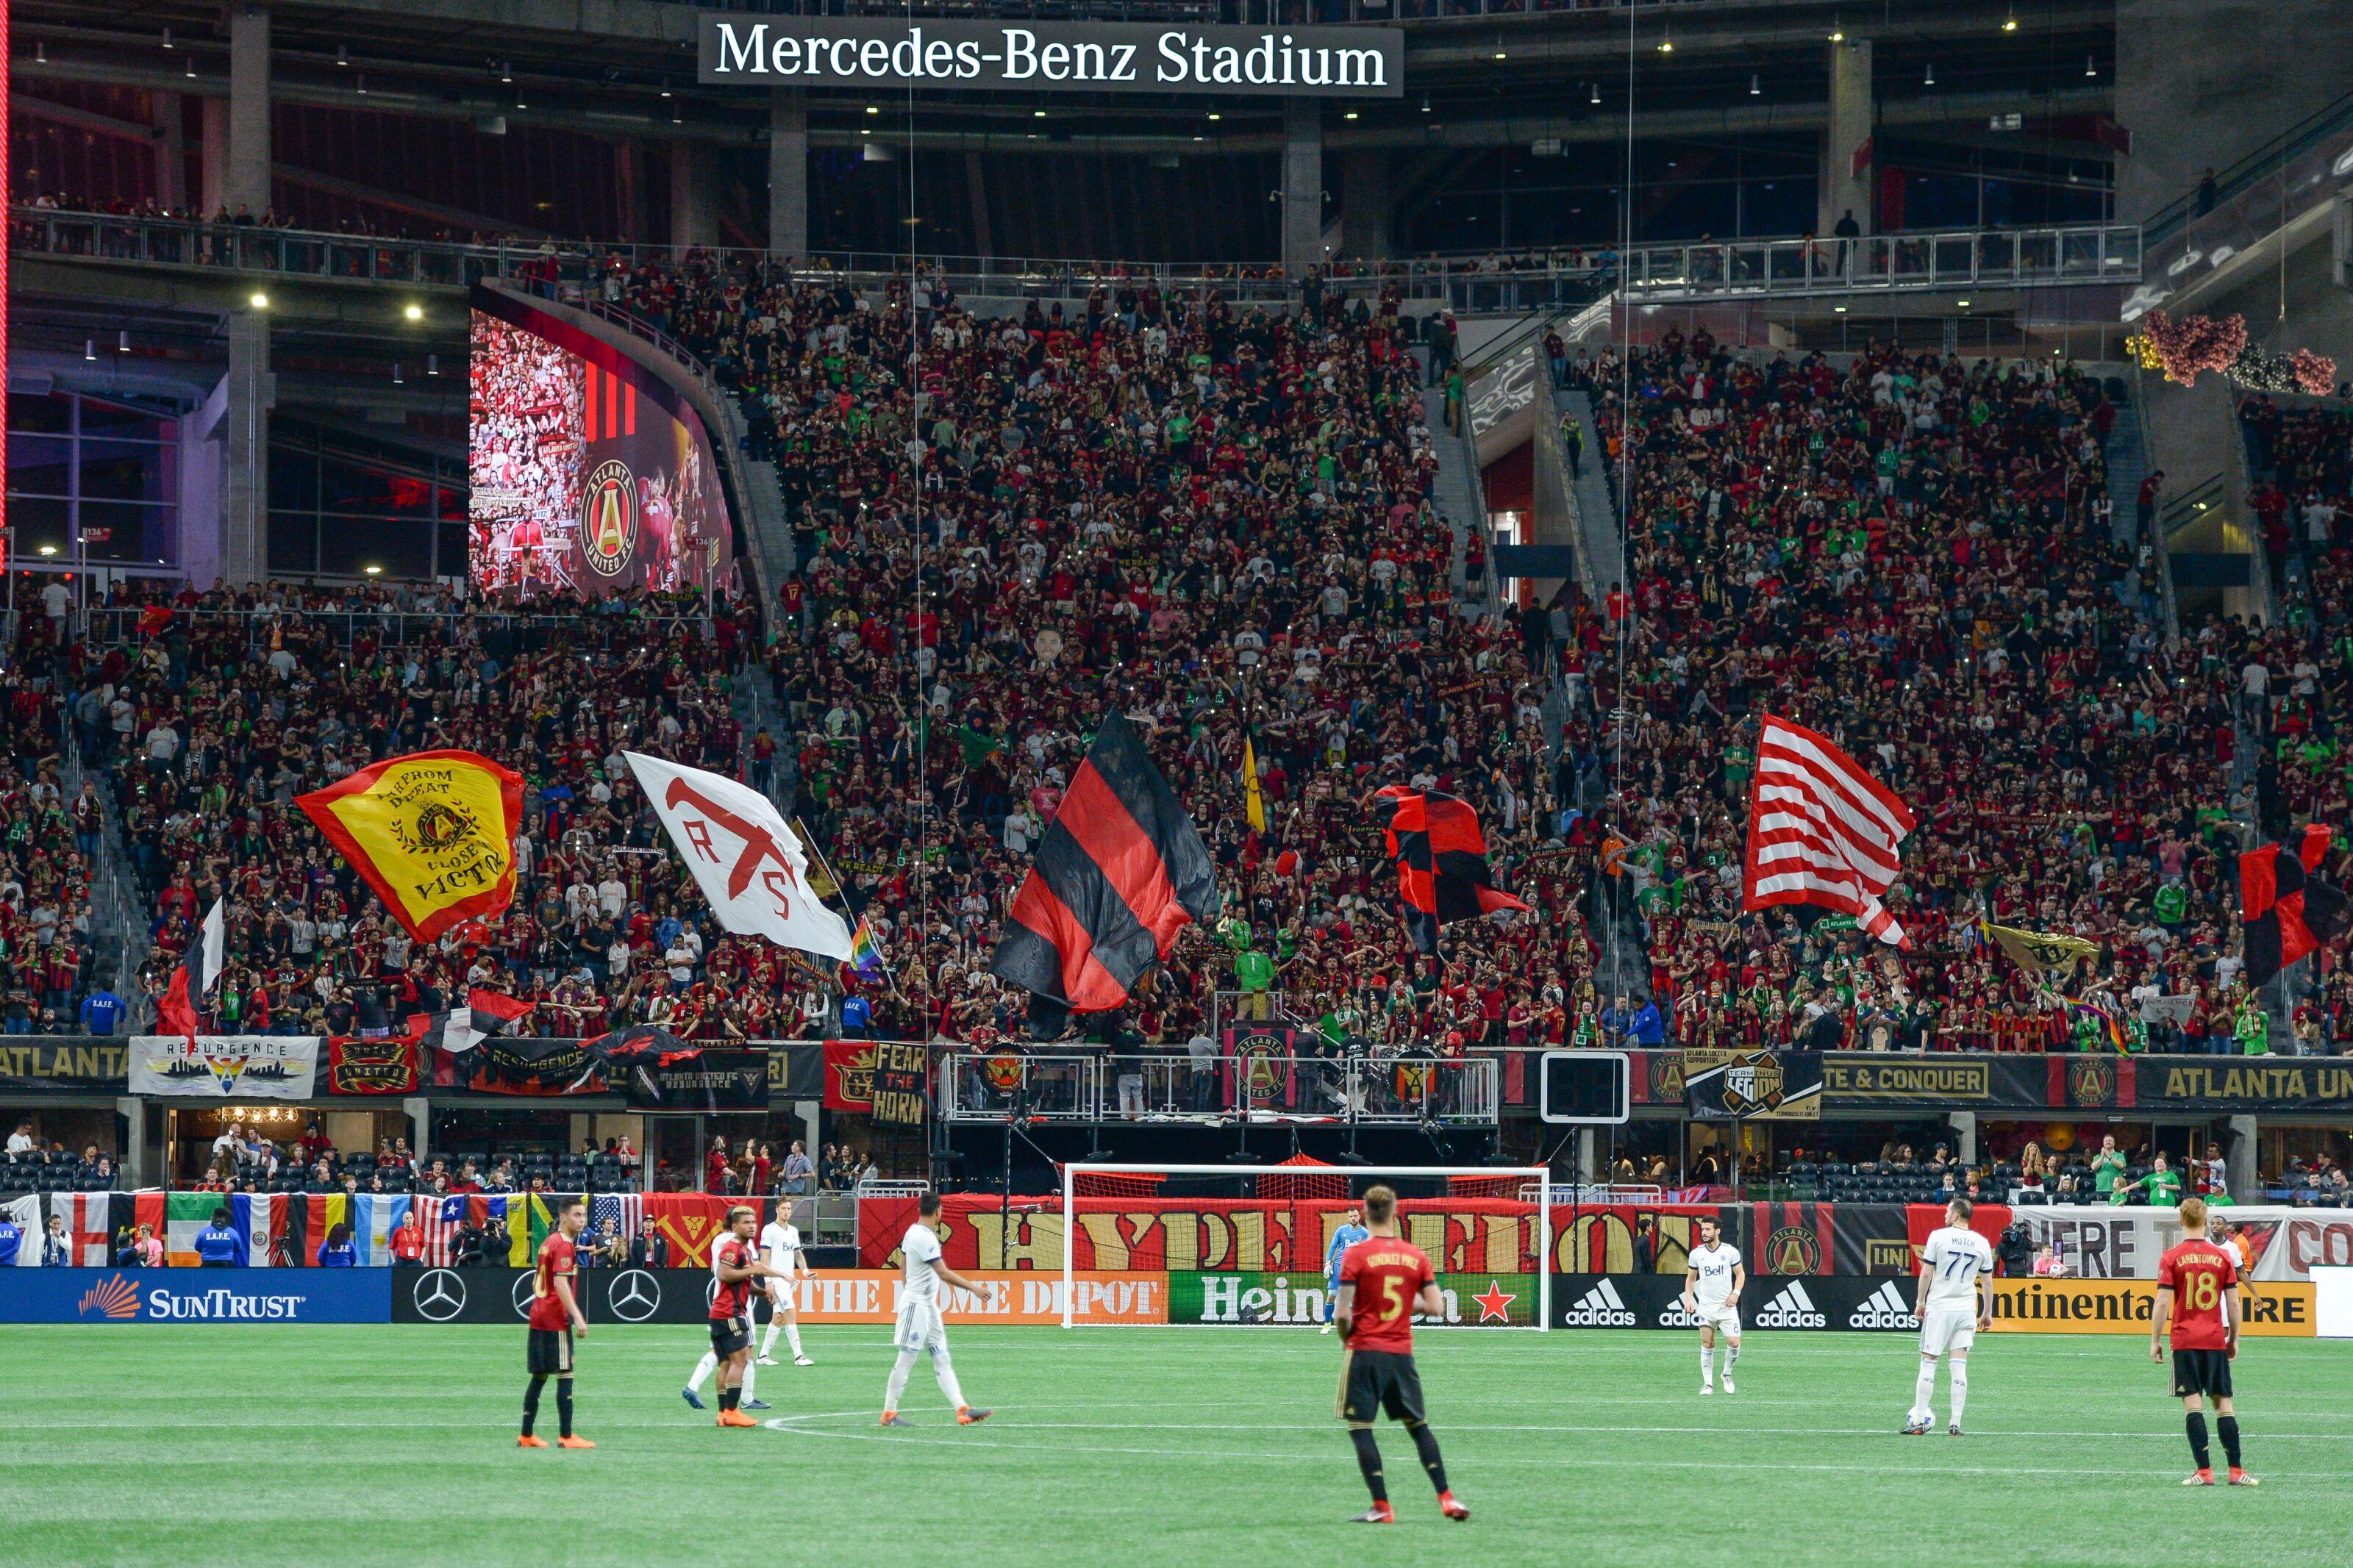 Mercedes Benz Columbus Ga >> Atlanta United: The Black Soccer Culture Nobody Knew Existed